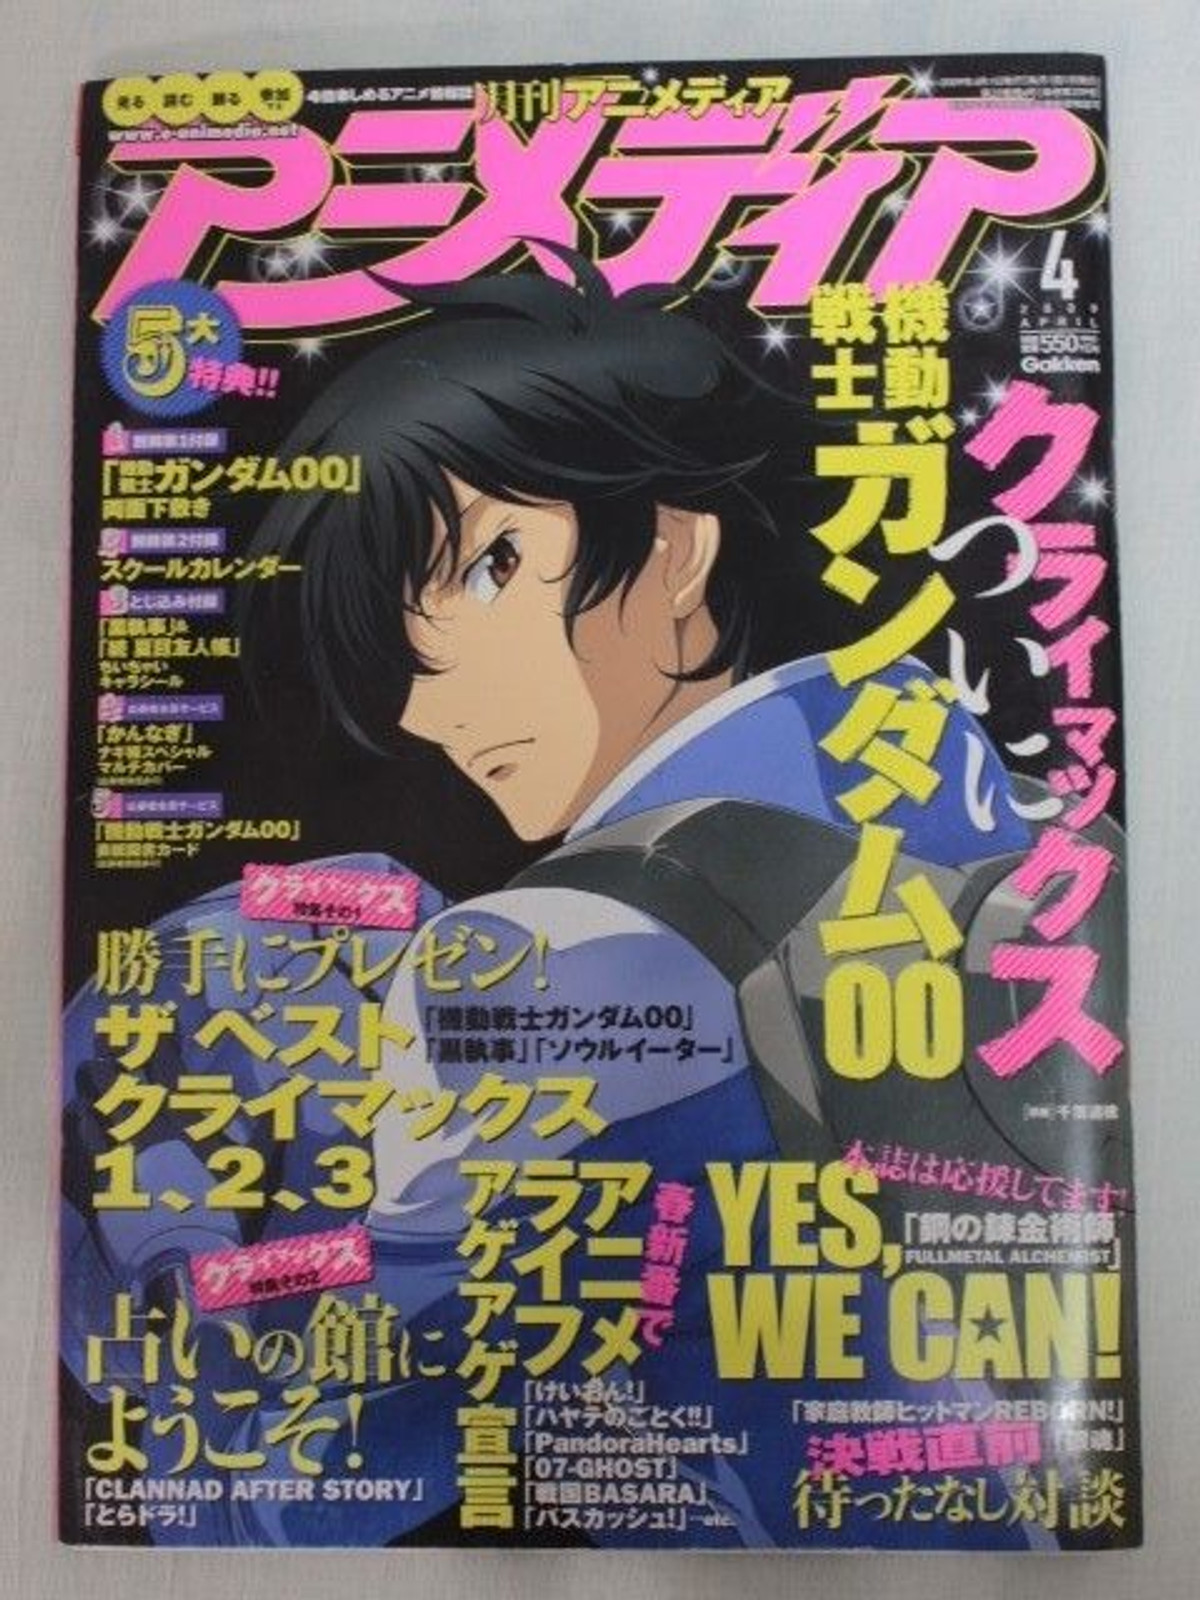 Animedia Japan Anime Magazine 04/2009 Gakken / GUNDAM00/SOUL EATER/PandoraHearts/